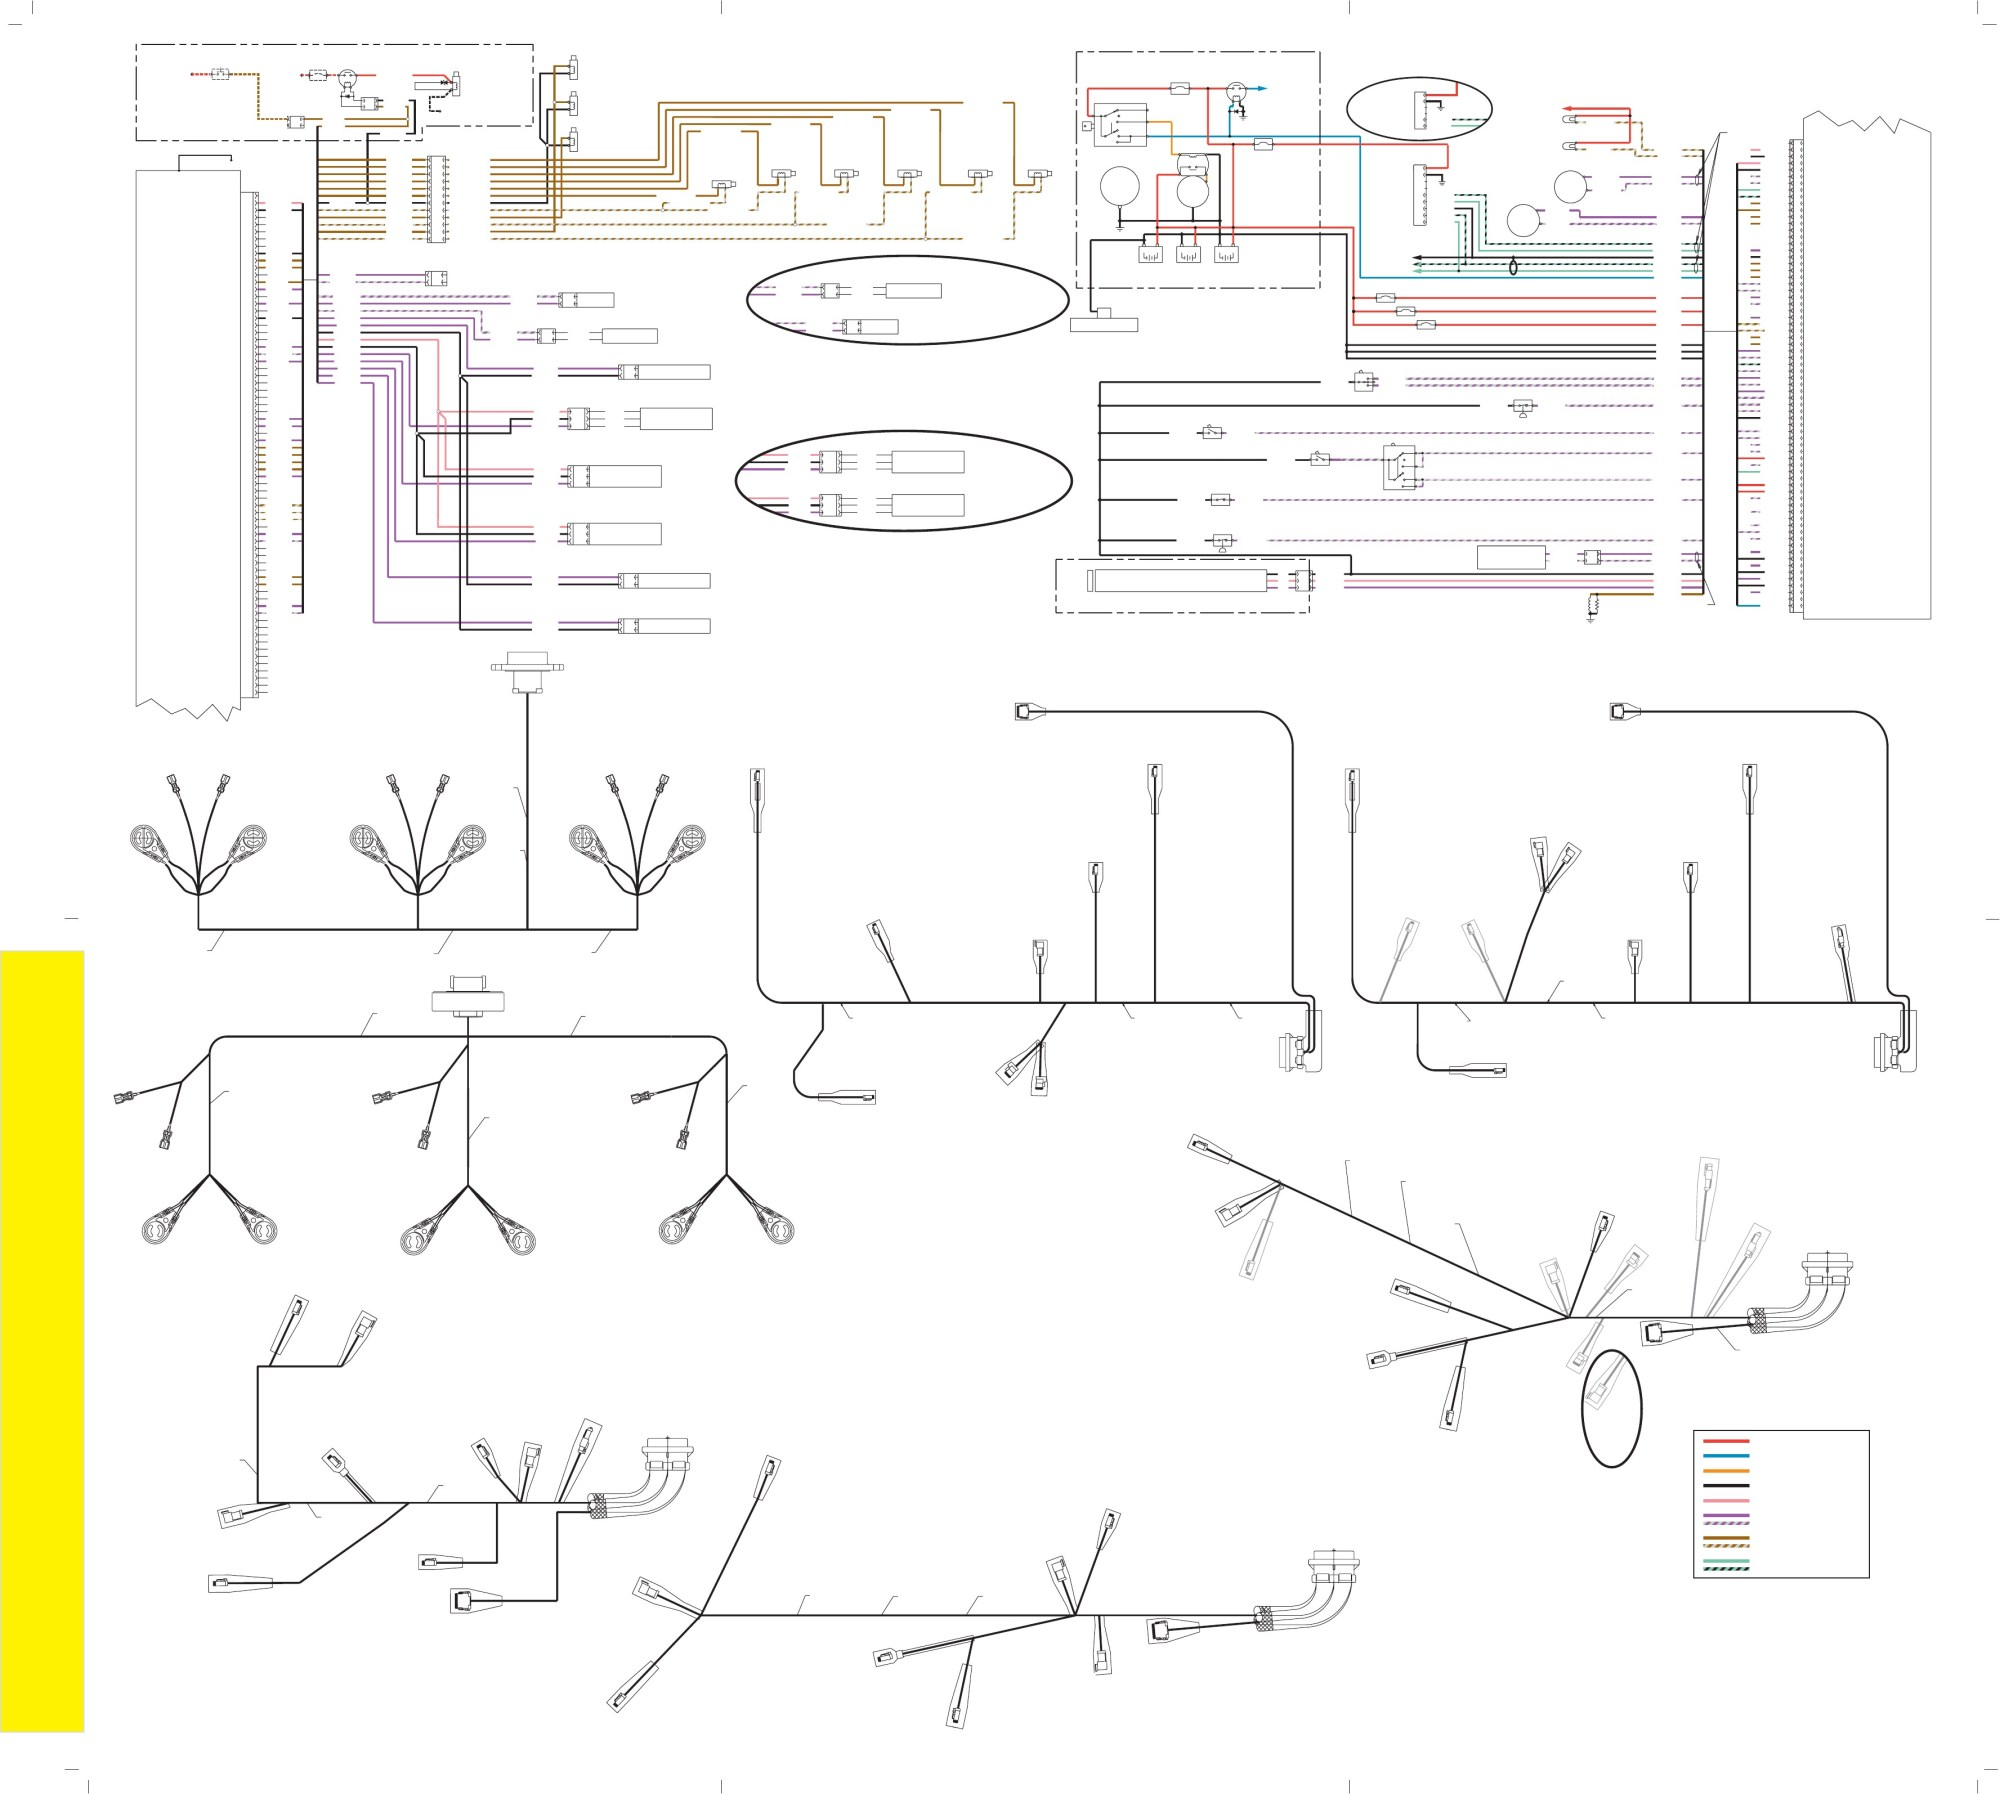 hight resolution of caterpillar c12 engine diagram diagrama electrico caterpillar 3406e c10 c12 c15 c16